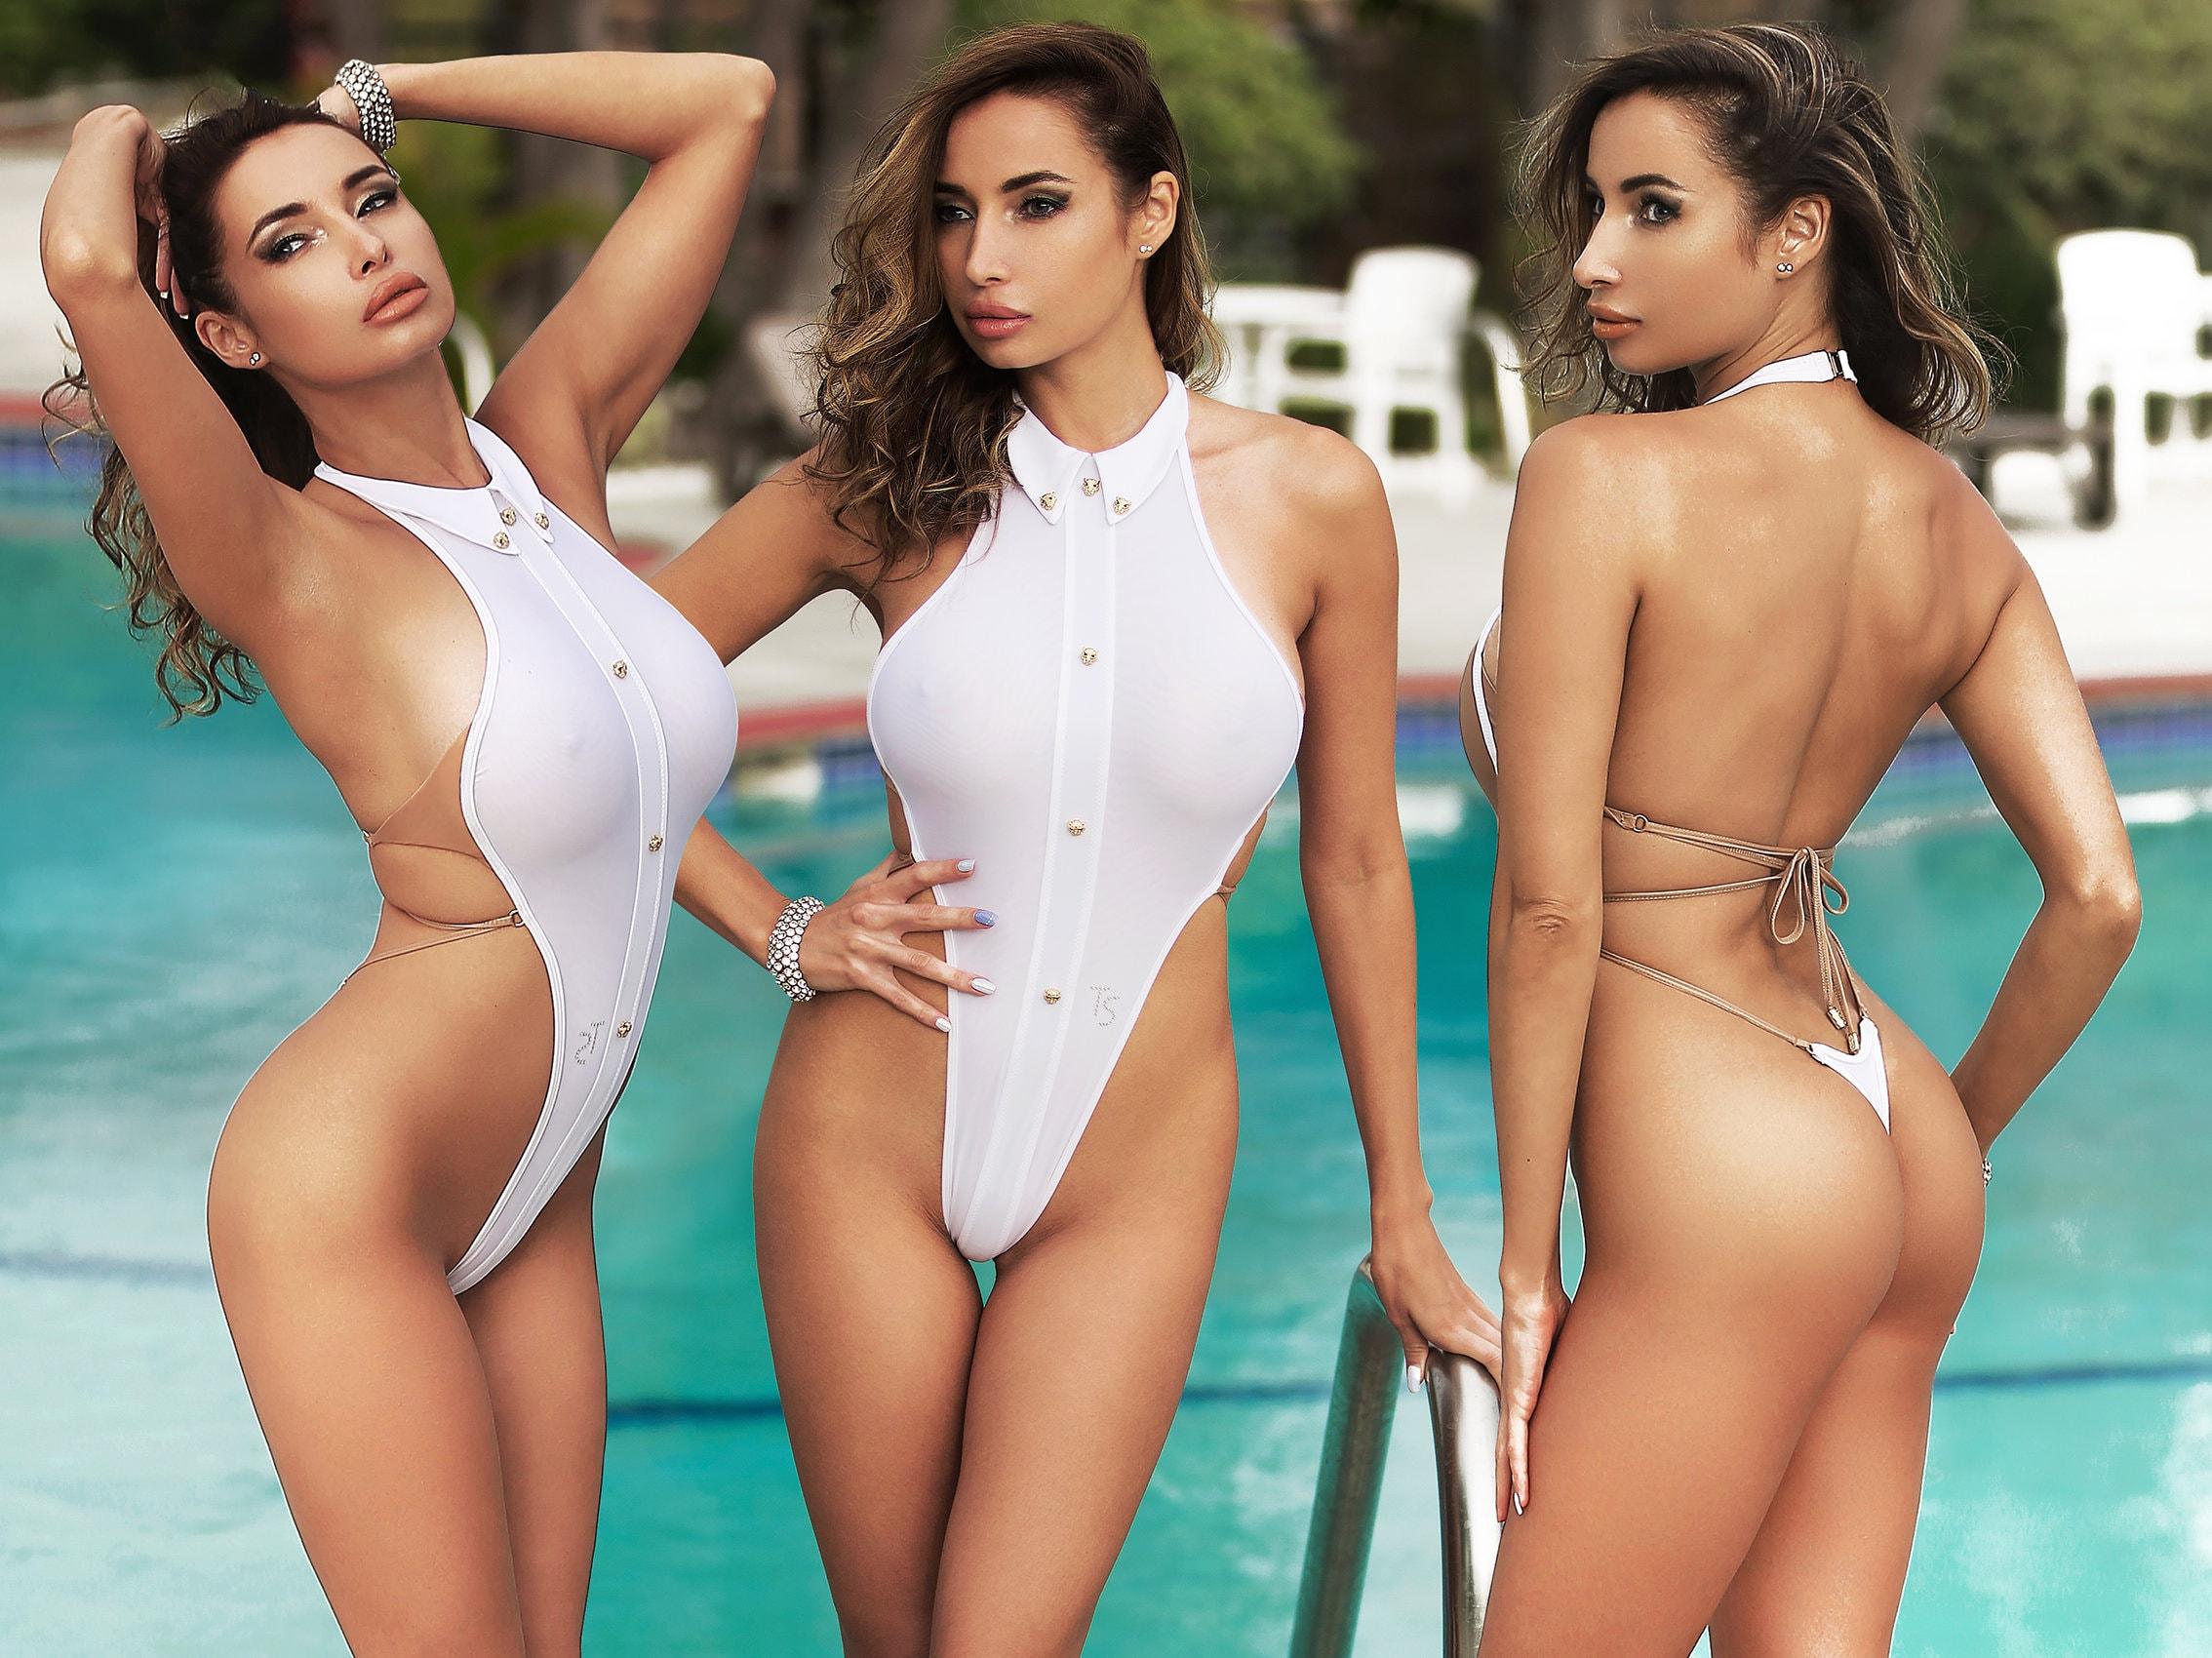 Hot bathing suit pics Erotic One Piece Swimsuit Bodysuit Bathing Suit Monokini Etsy